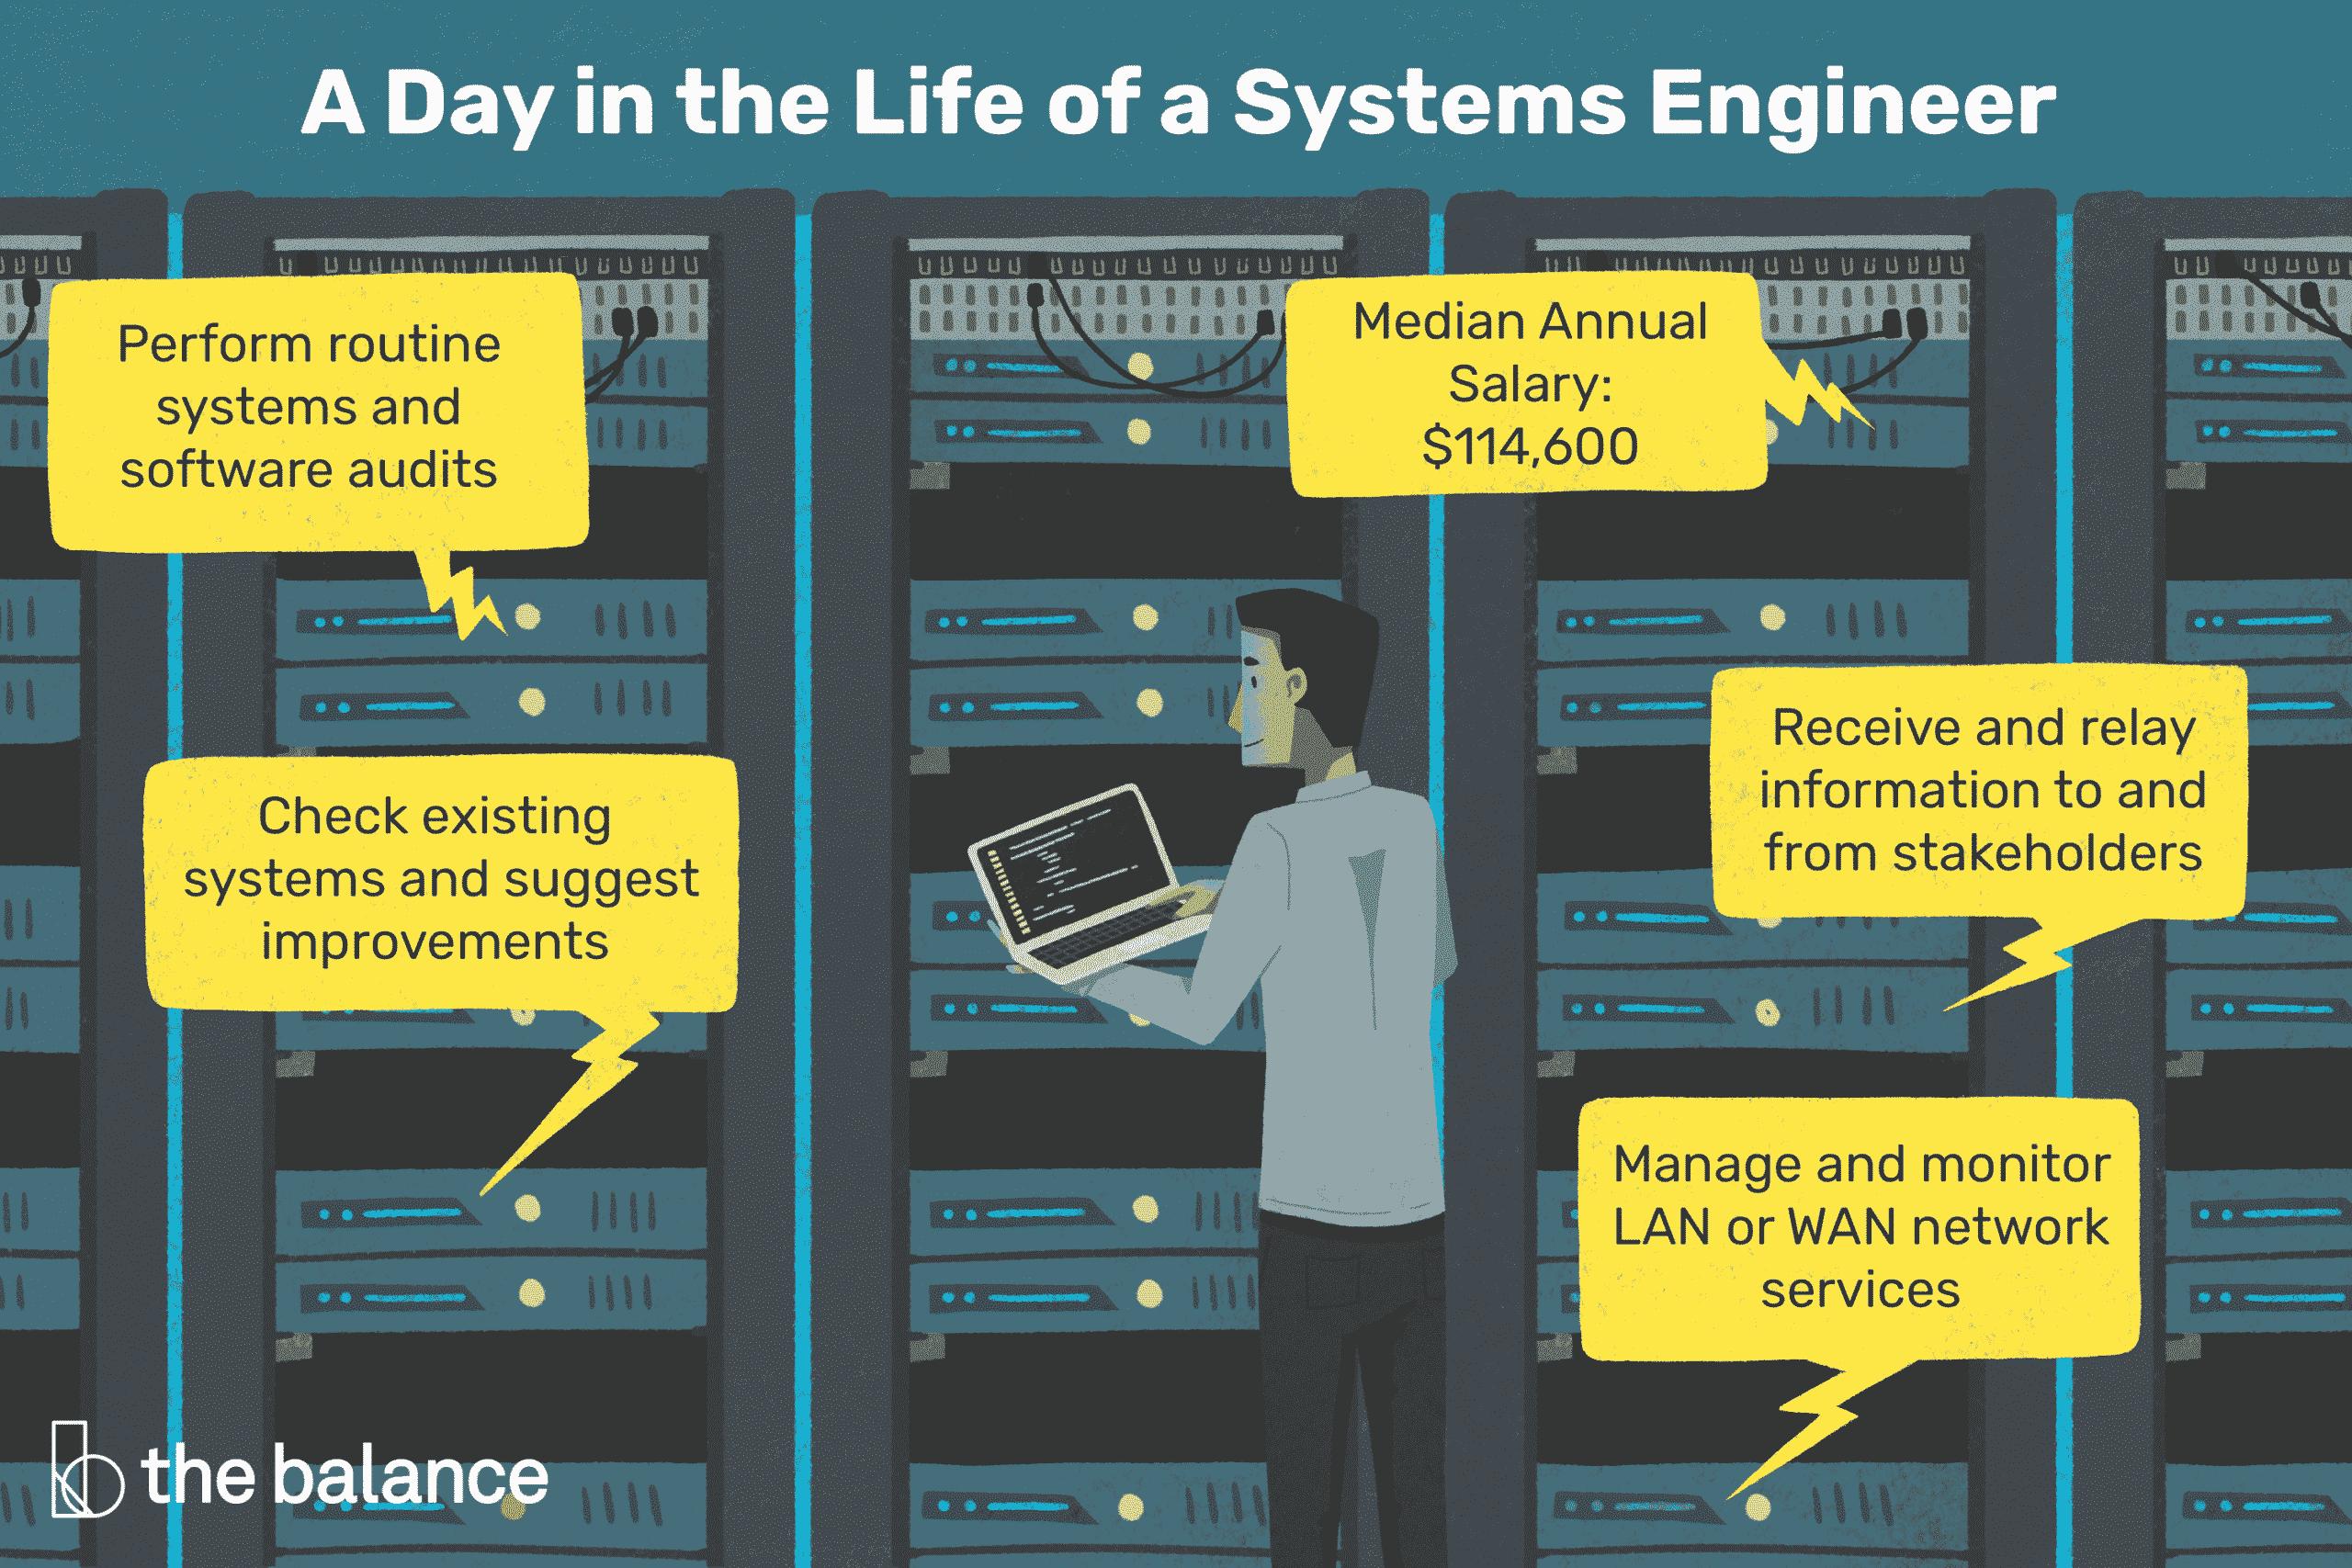 computer-system-engineer-job-responsibilities